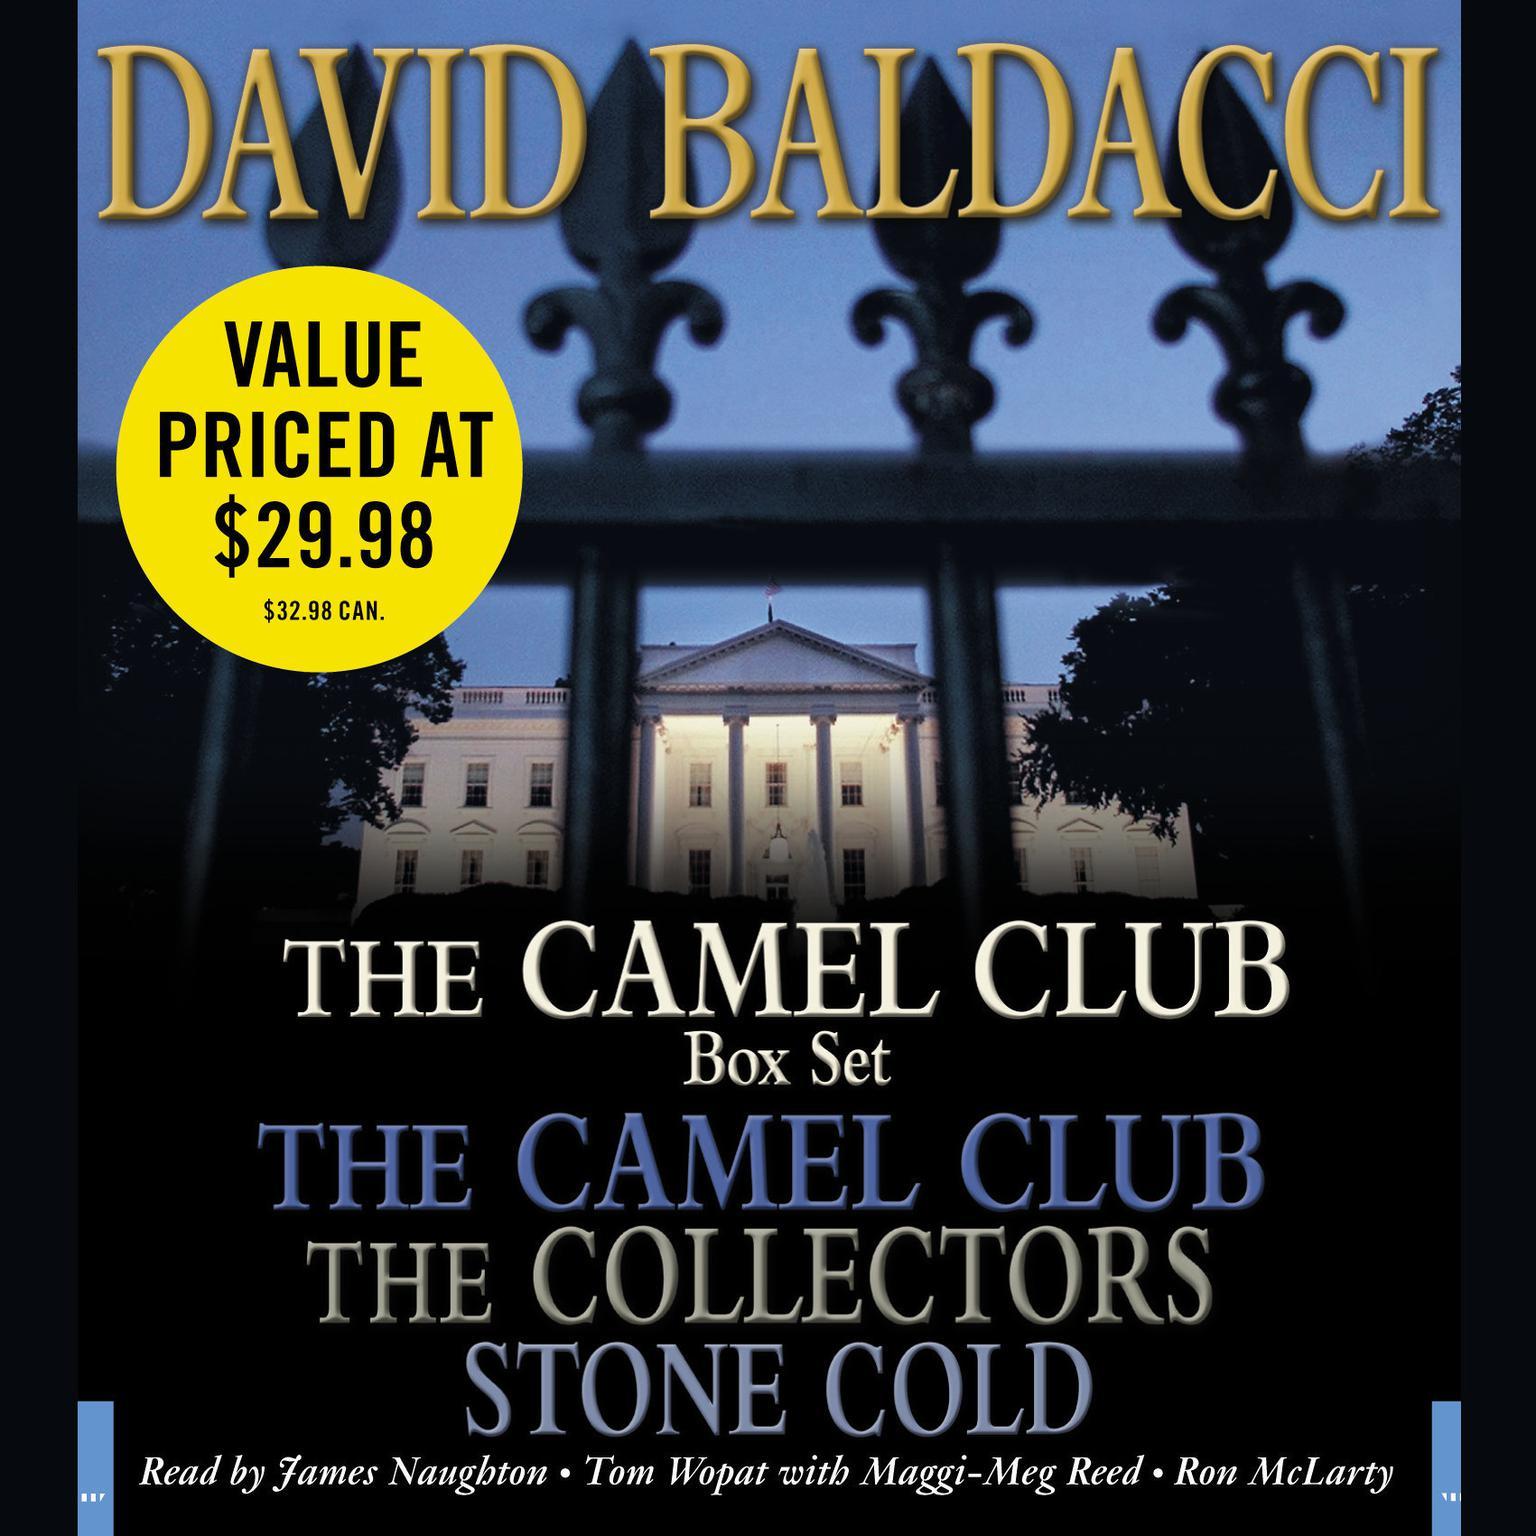 The Camel Club Audio Box Set (Abridged) Audiobook, by David Baldacci